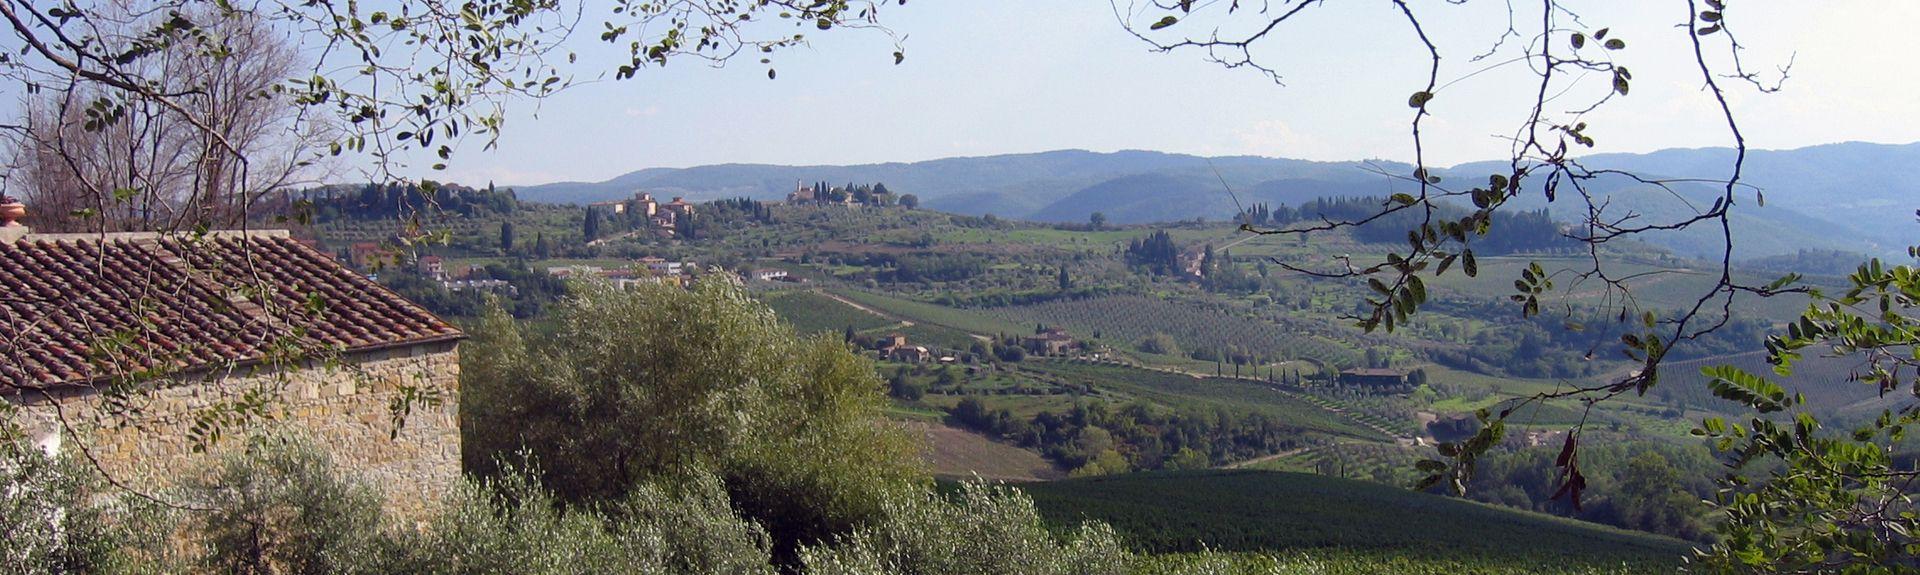 San Prospero, Province of Modena, Emilia-Romagna, Italy